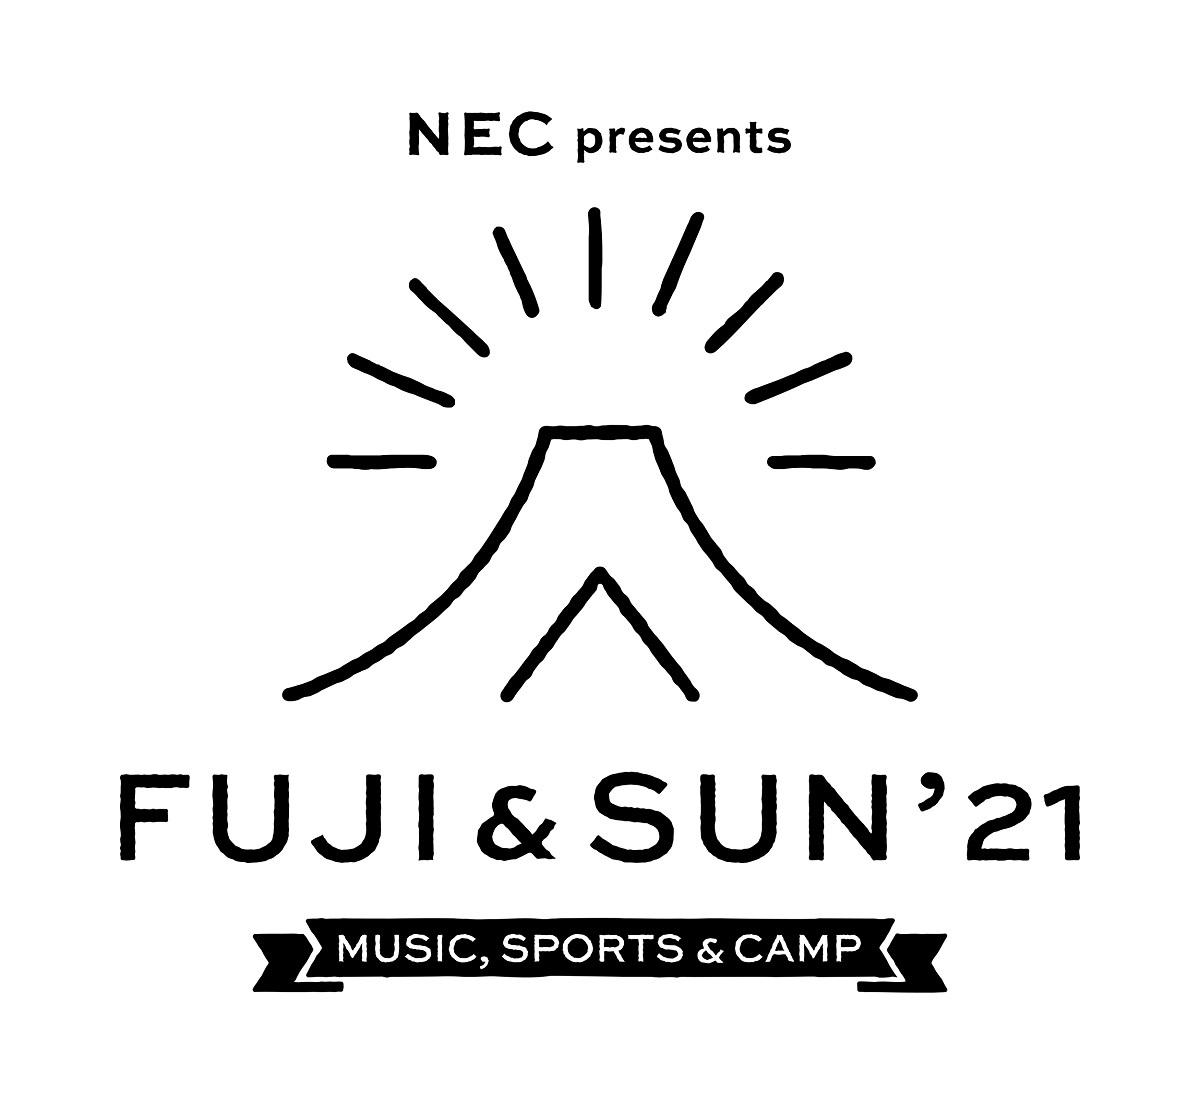 FUJI & SUN'21 ロゴ